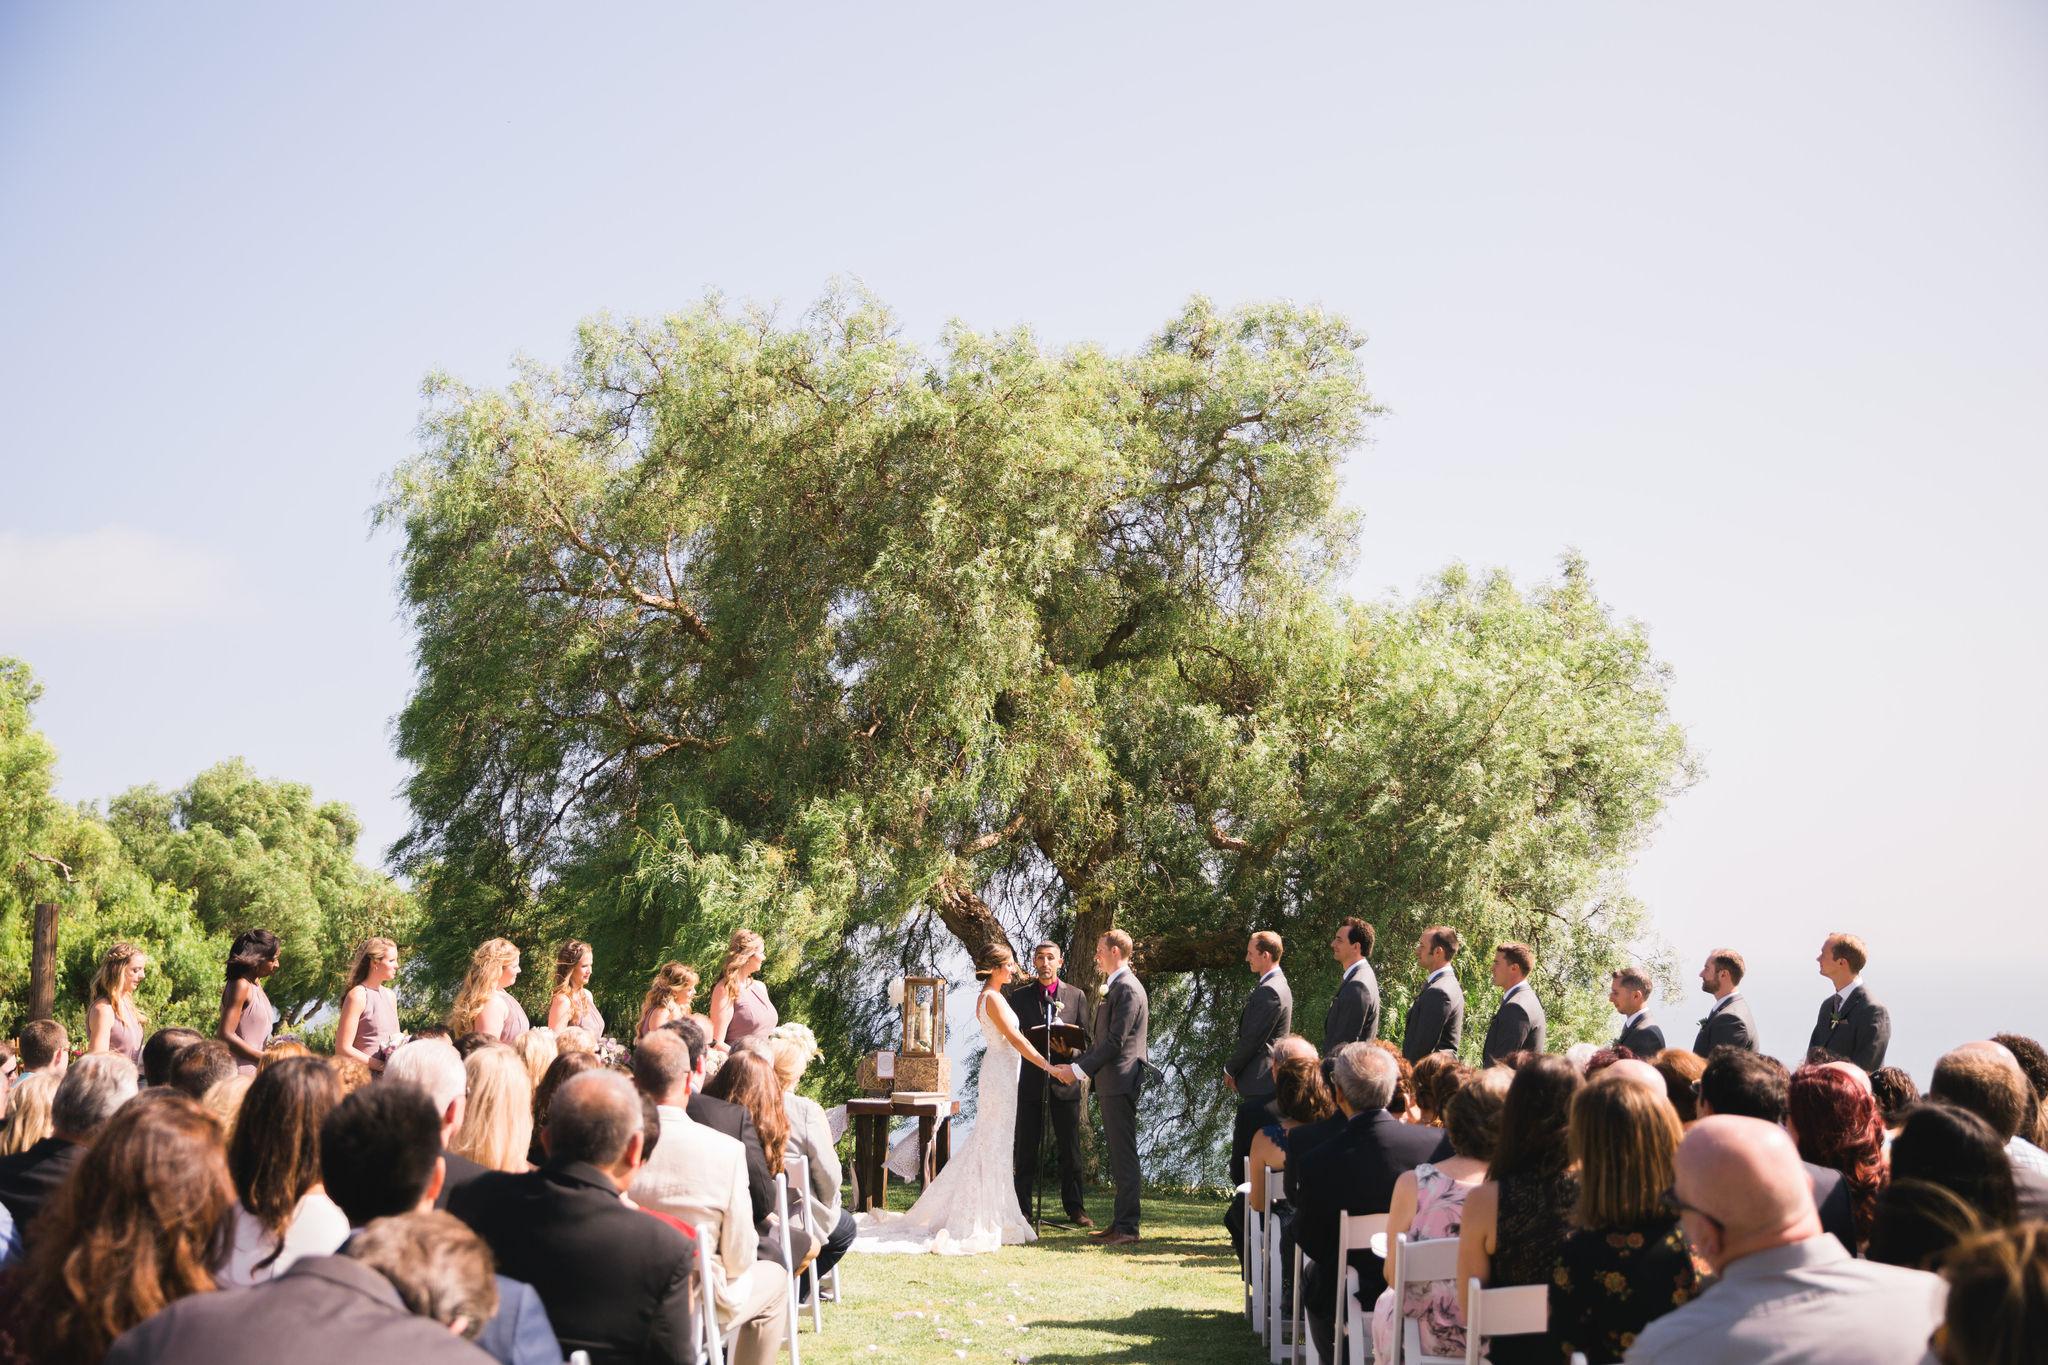 Catalina View Gardens Ceremony